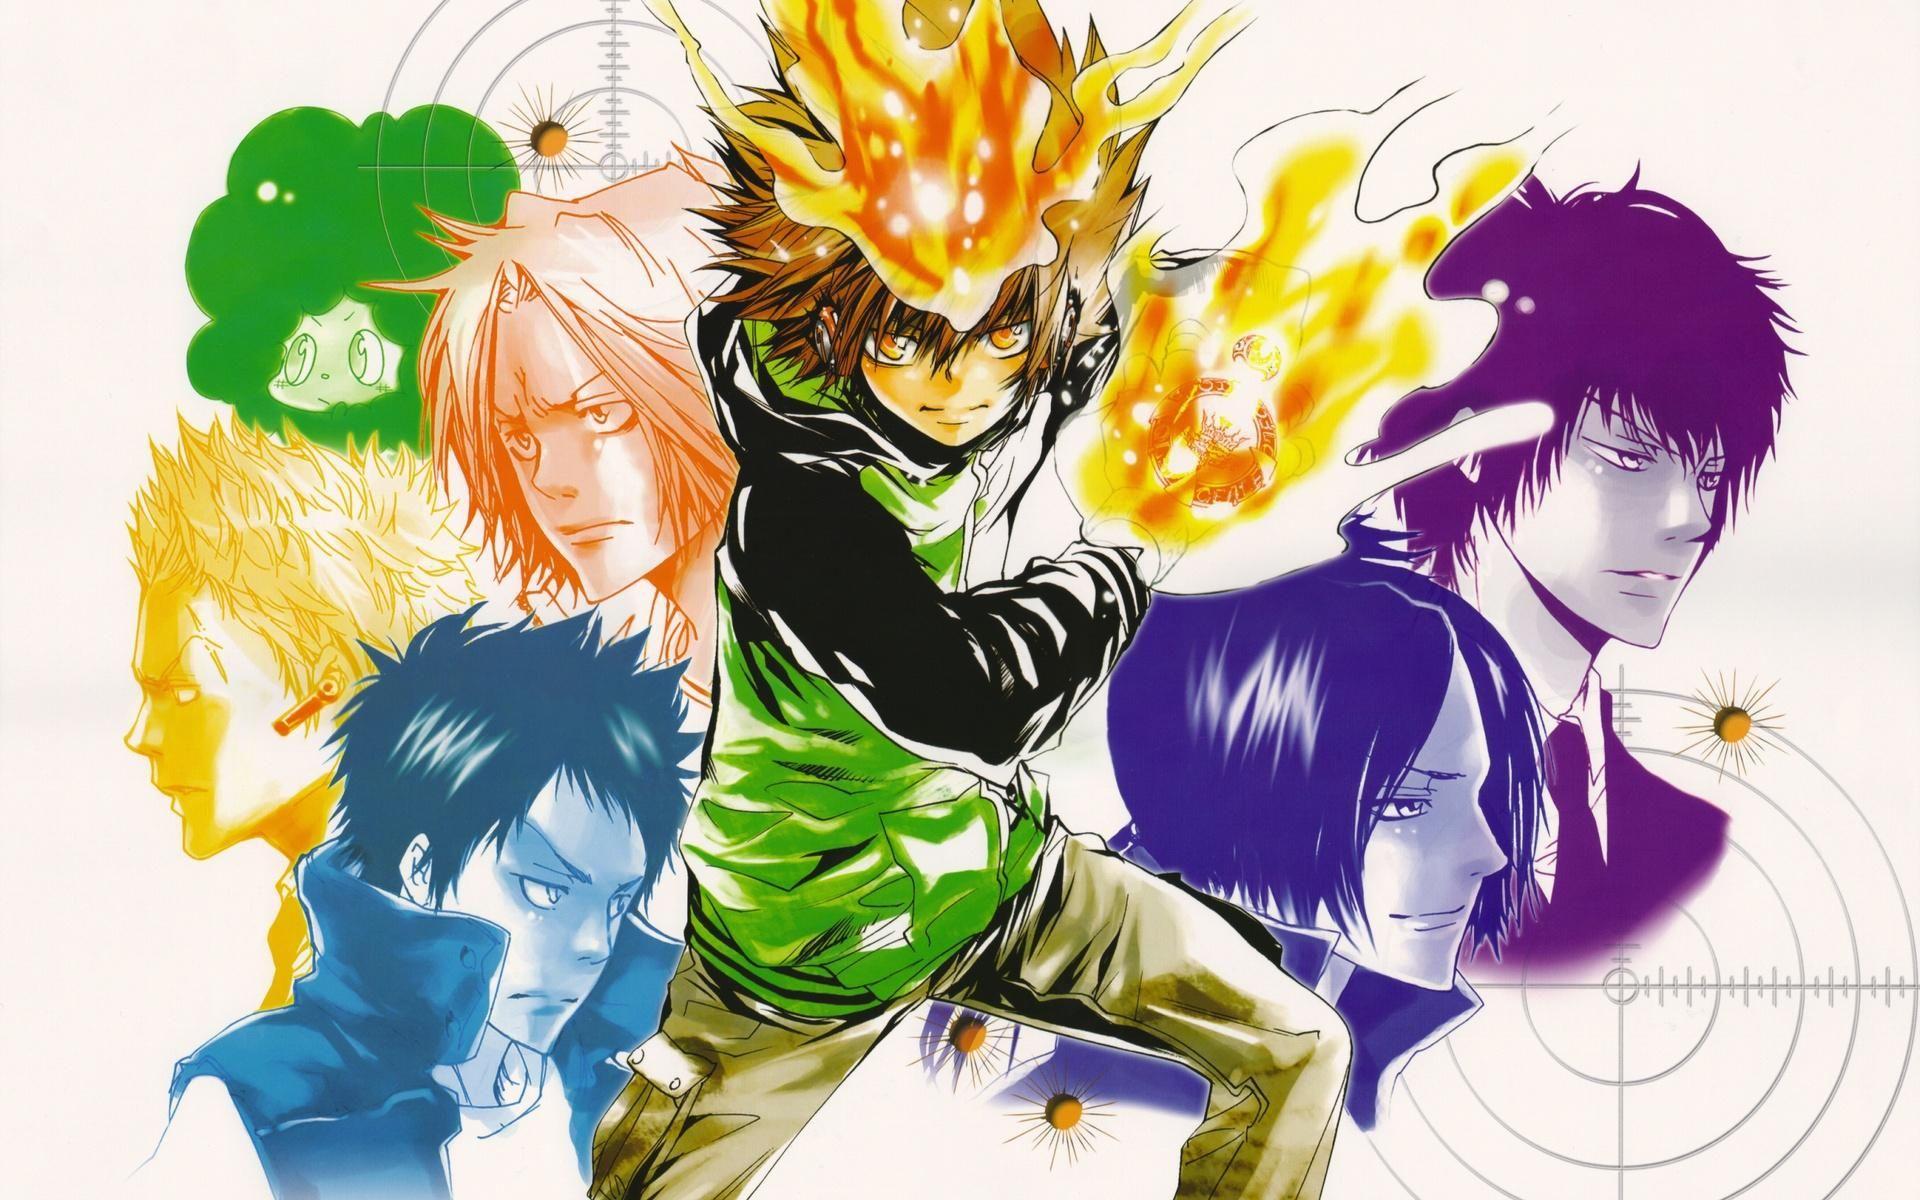 Katekyo hitman reborn wallpaper random anime pinterest hitman katekyo hitman reborn wallpaper voltagebd Gallery